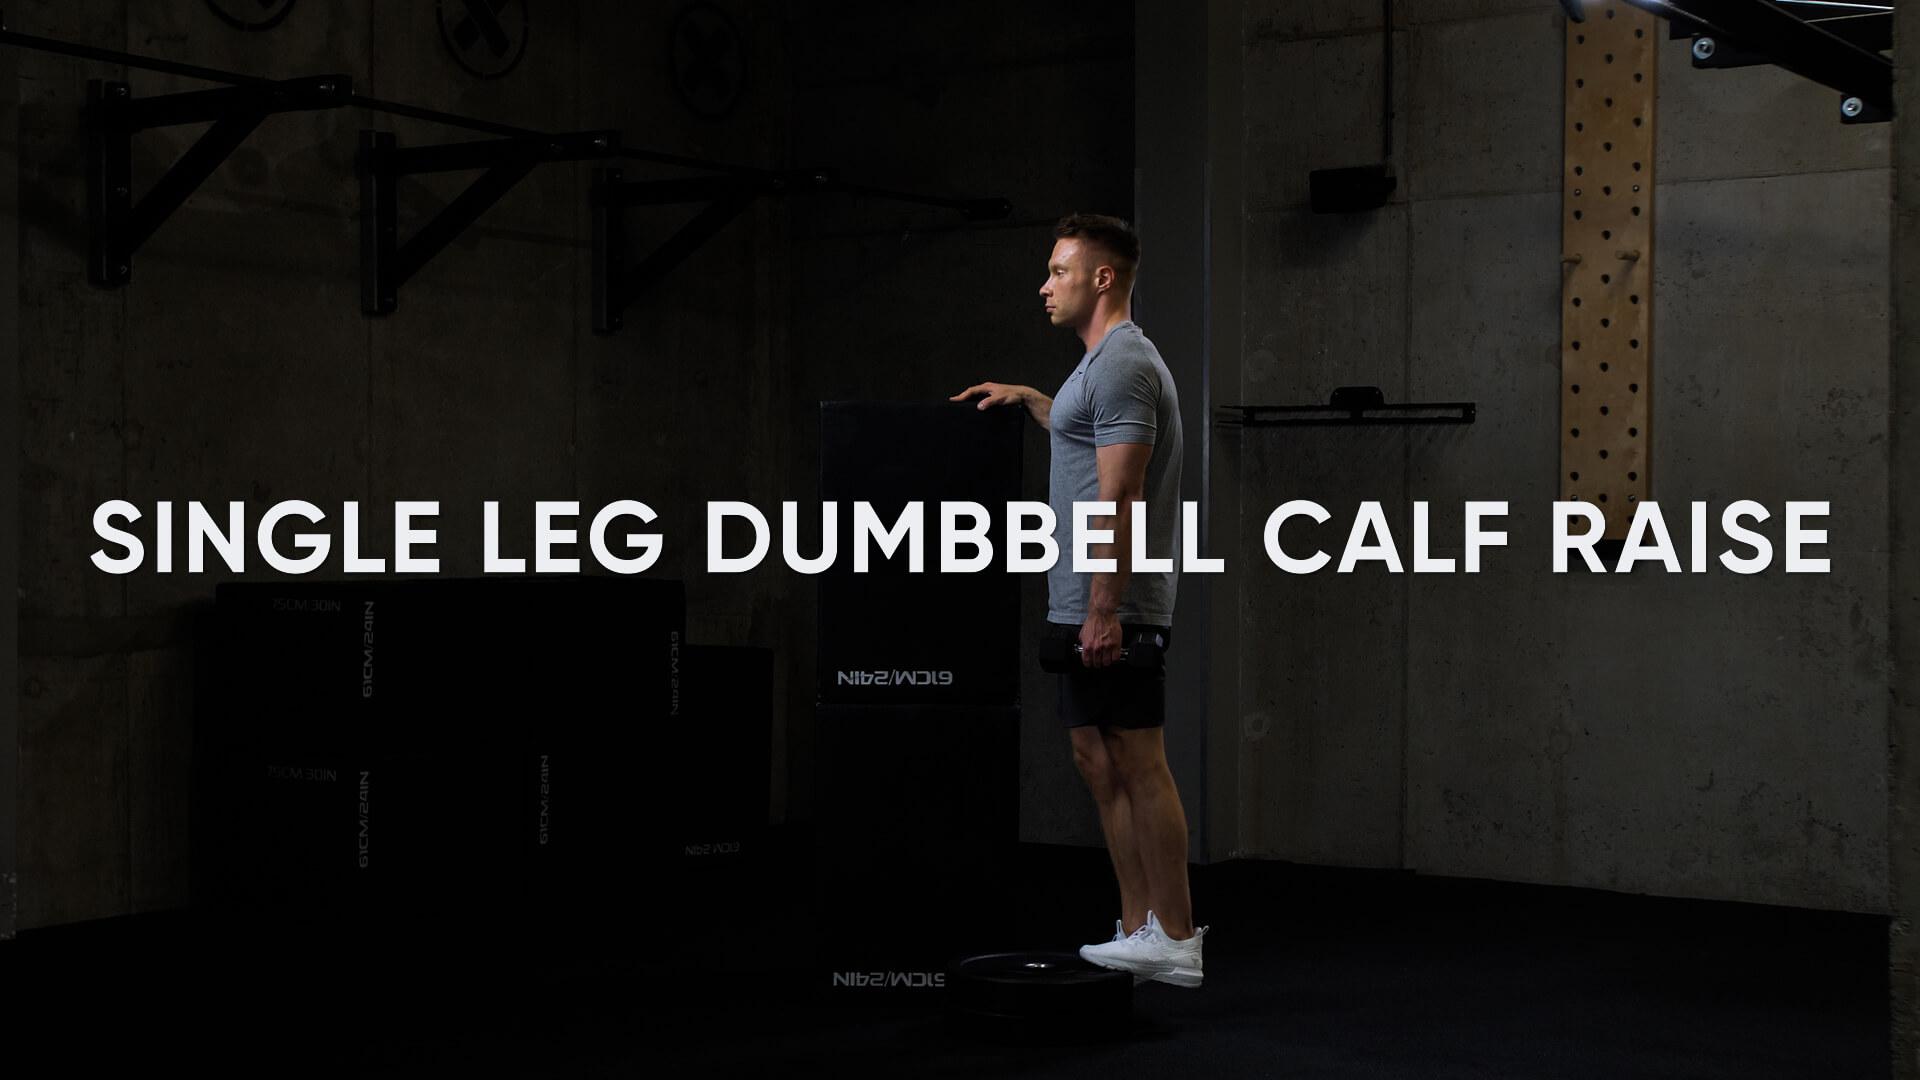 Single Leg Dumbbell Calf Raise